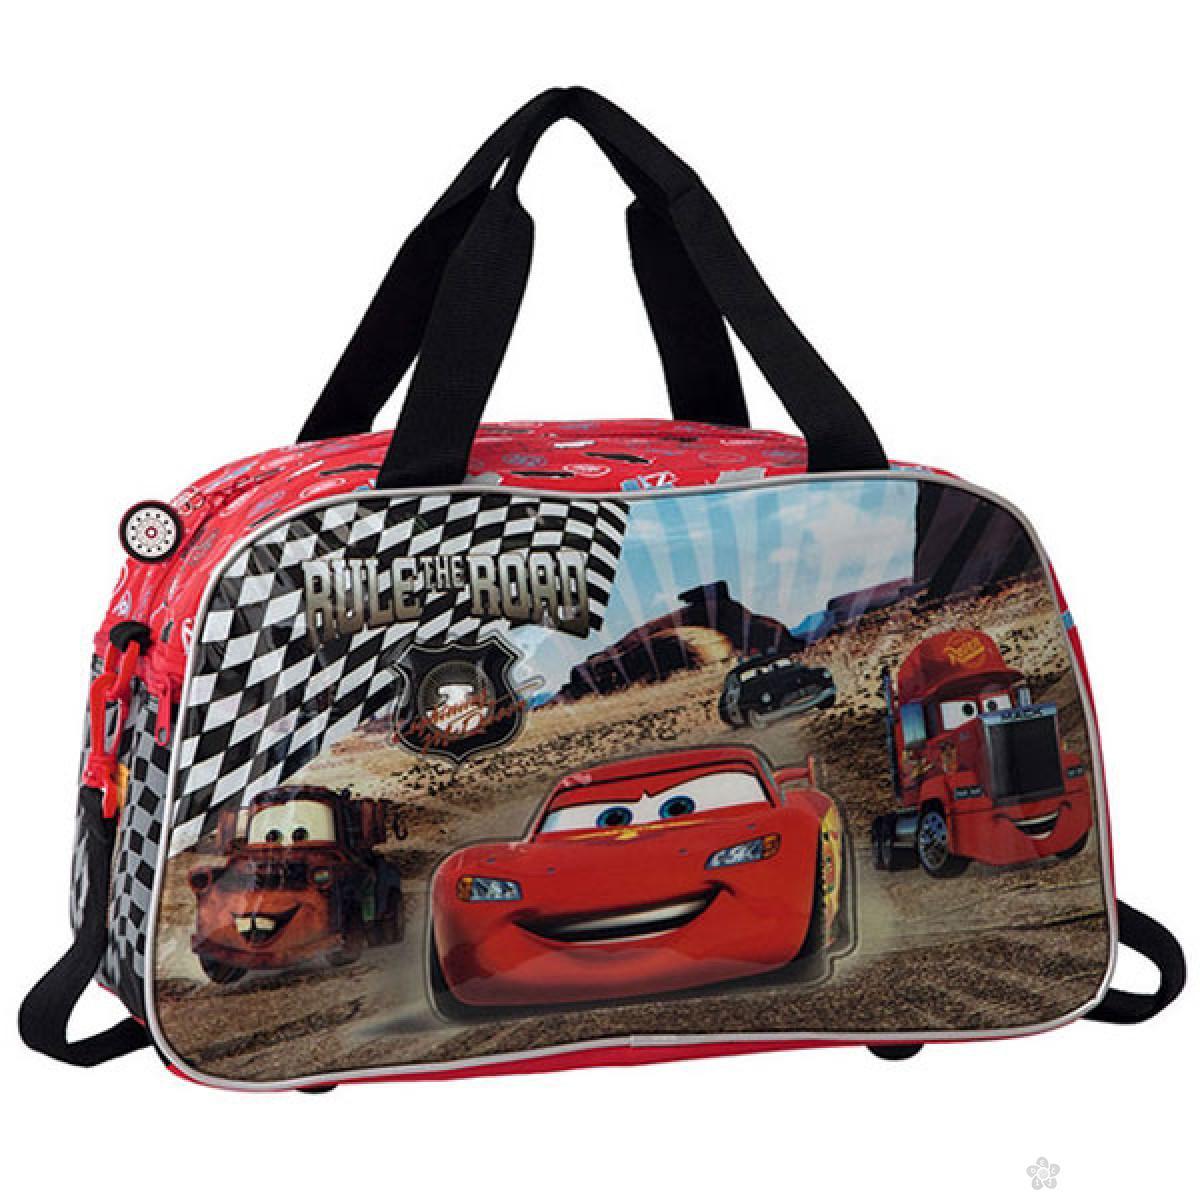 Putna torba Cars 21.233.51